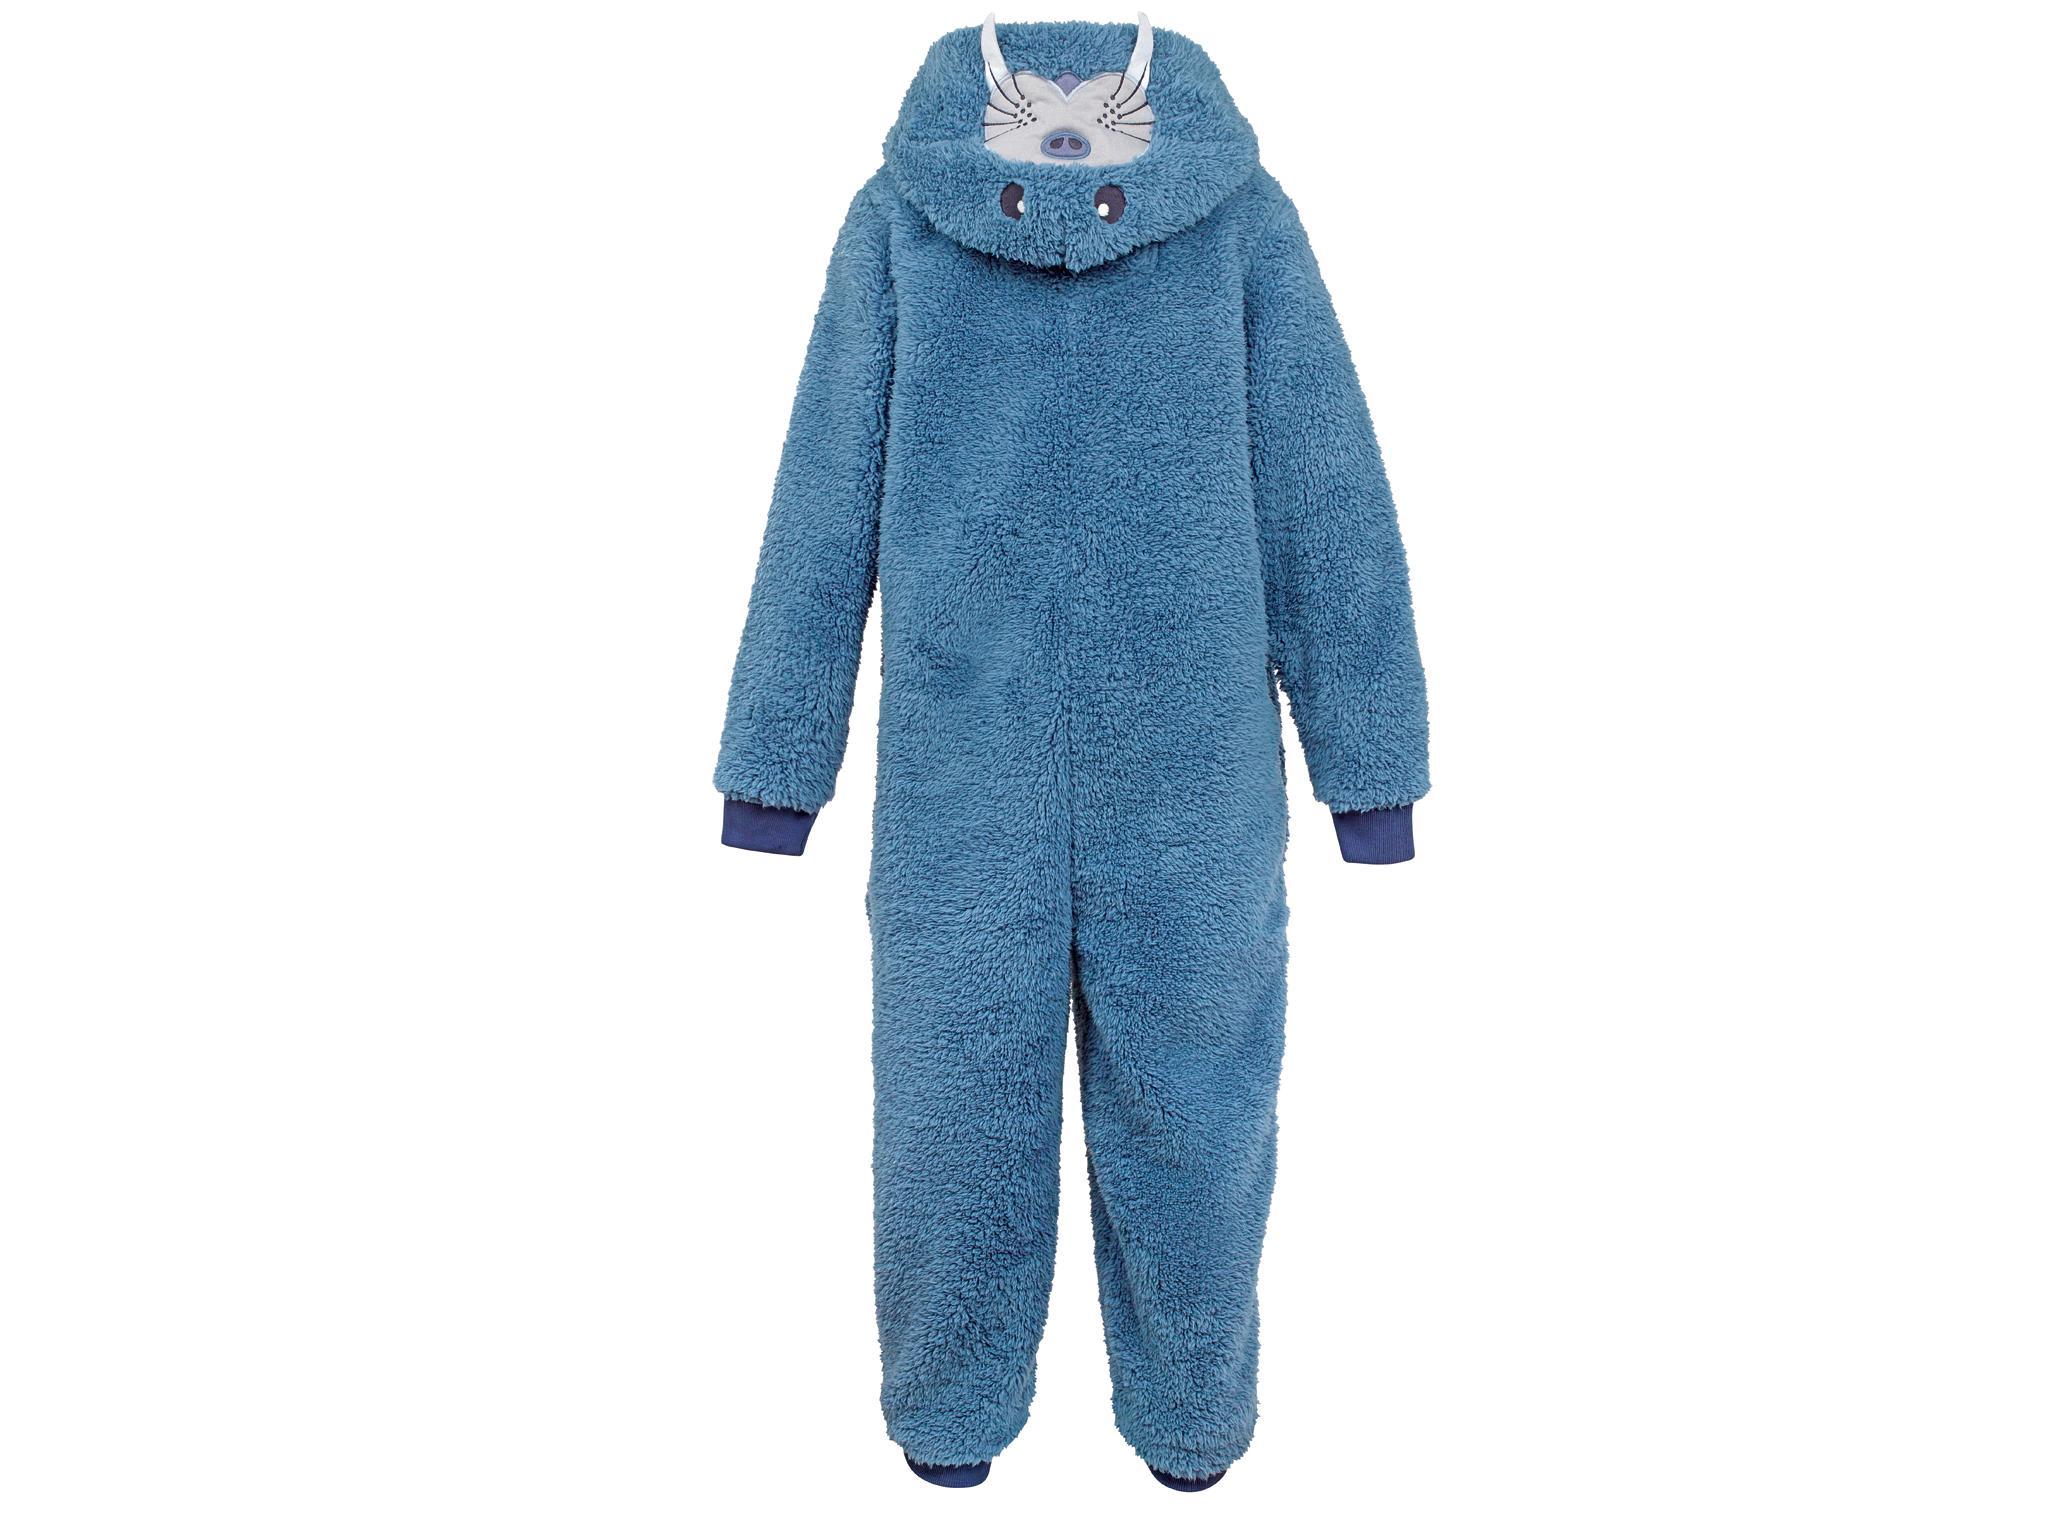 15 best sleepwear brands for kids   The Independent